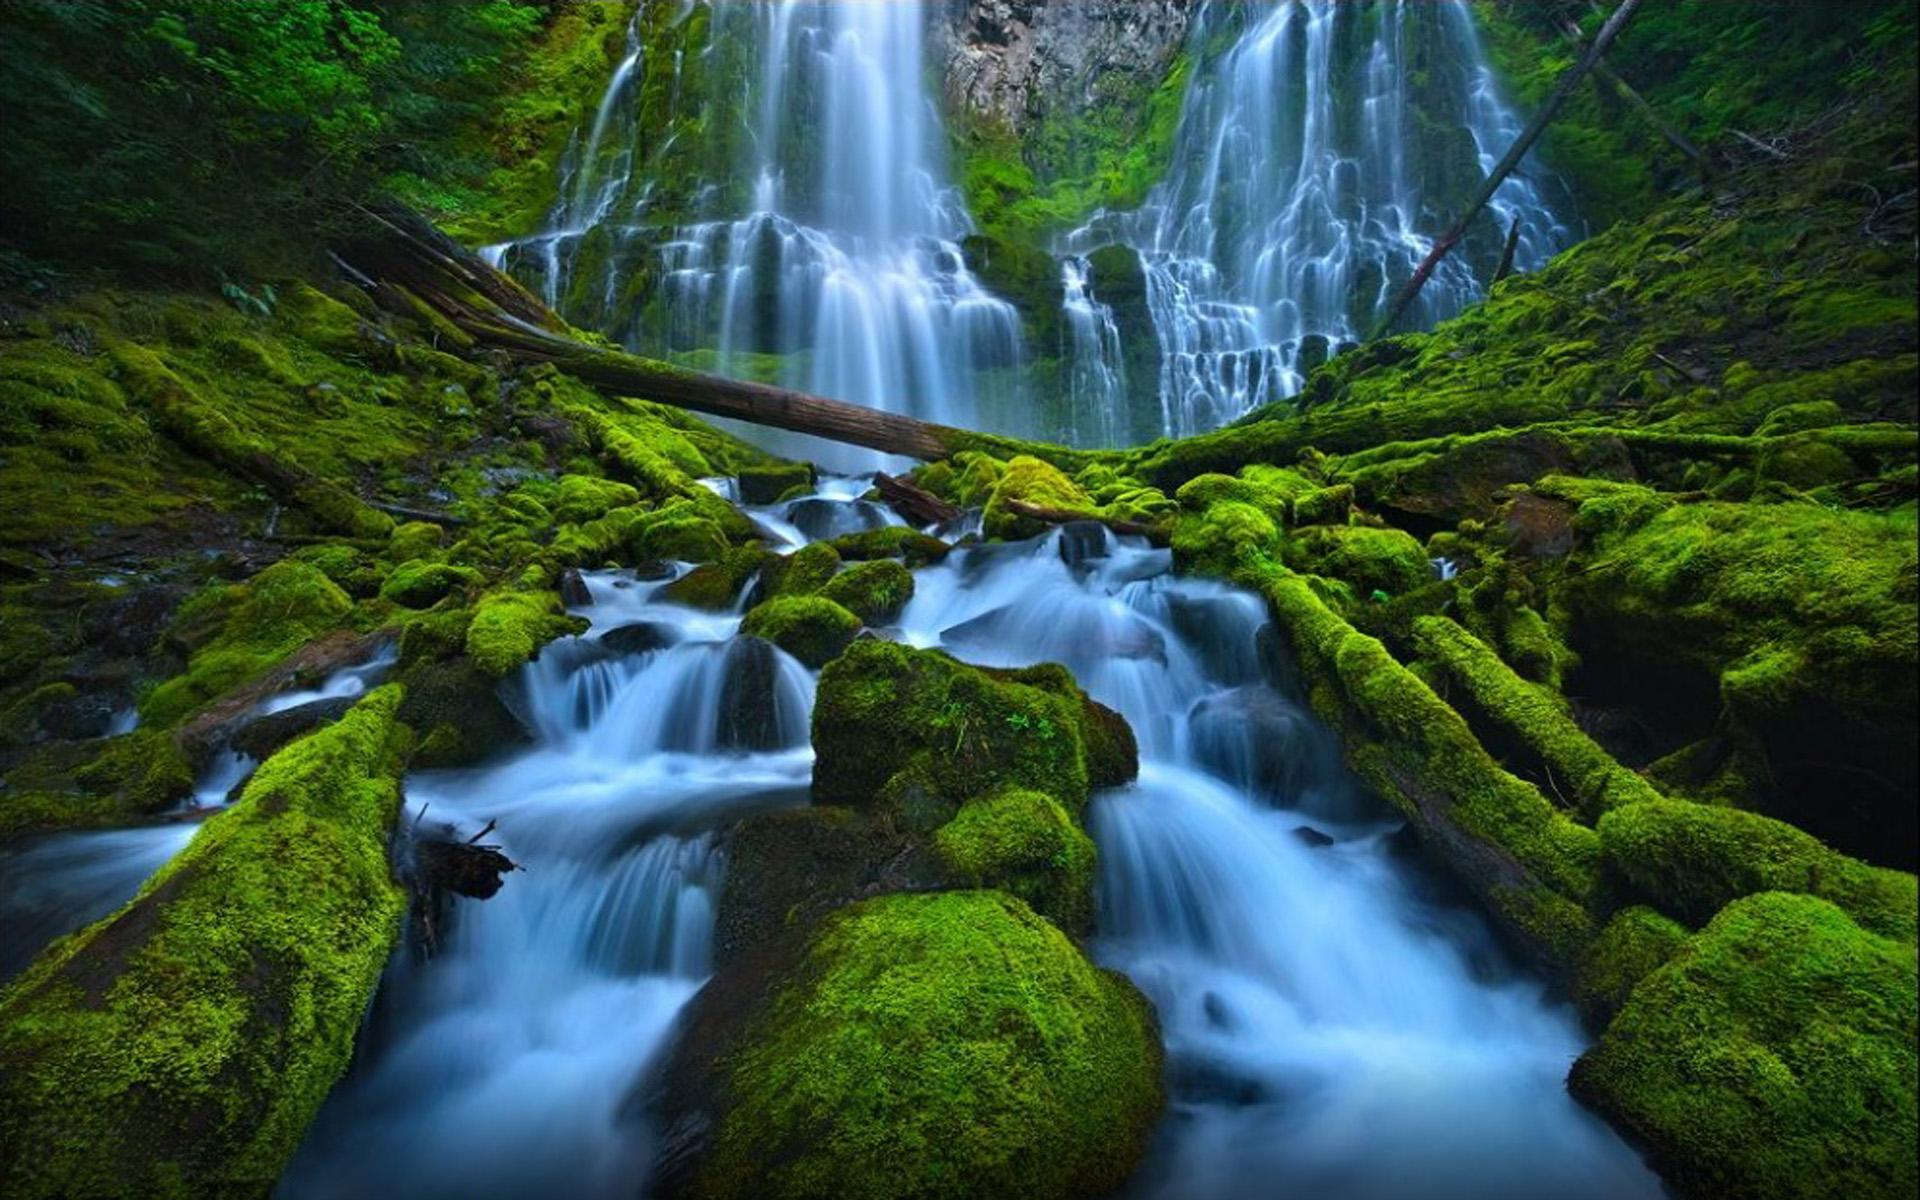 Iphone X Usa Wallpaper Beautiful Waterfall Rocks Green Moss Proxy Falls Eugene